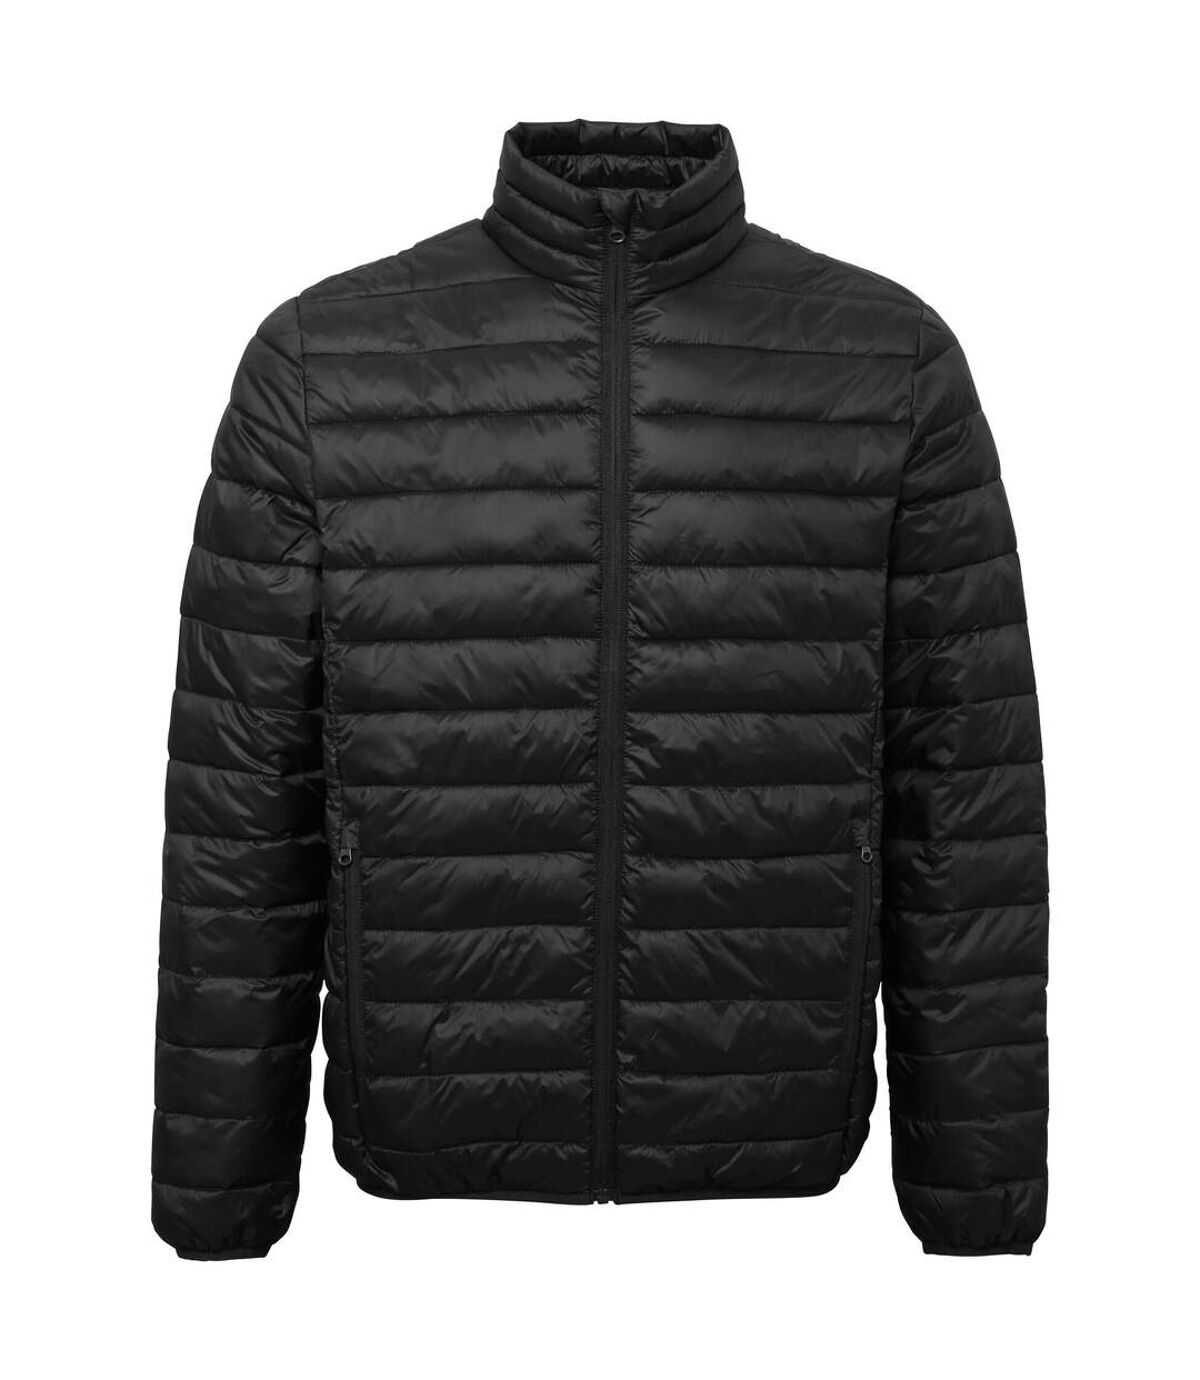 2786 Mens Terrain Long Sleeves Padded Jacket (Black) - UTRW6282